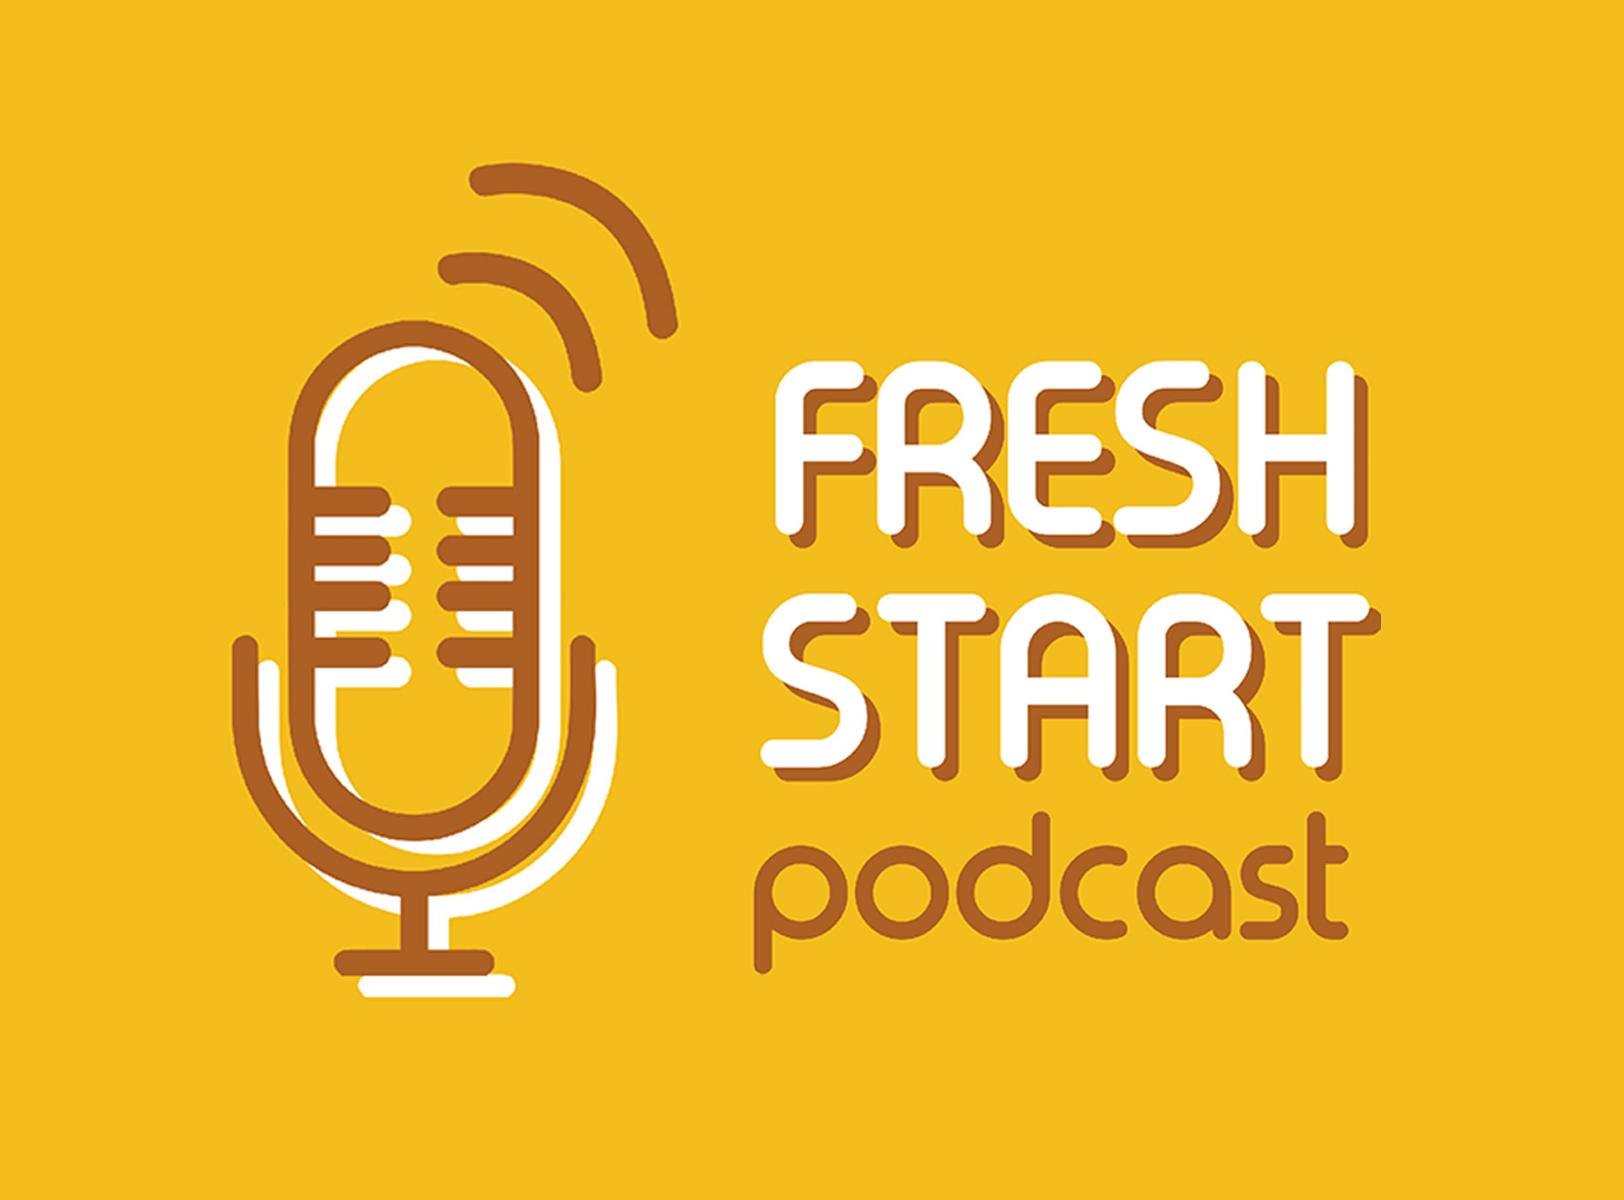 Fresh Start: Podcast News (1/16/2020 Thu.)